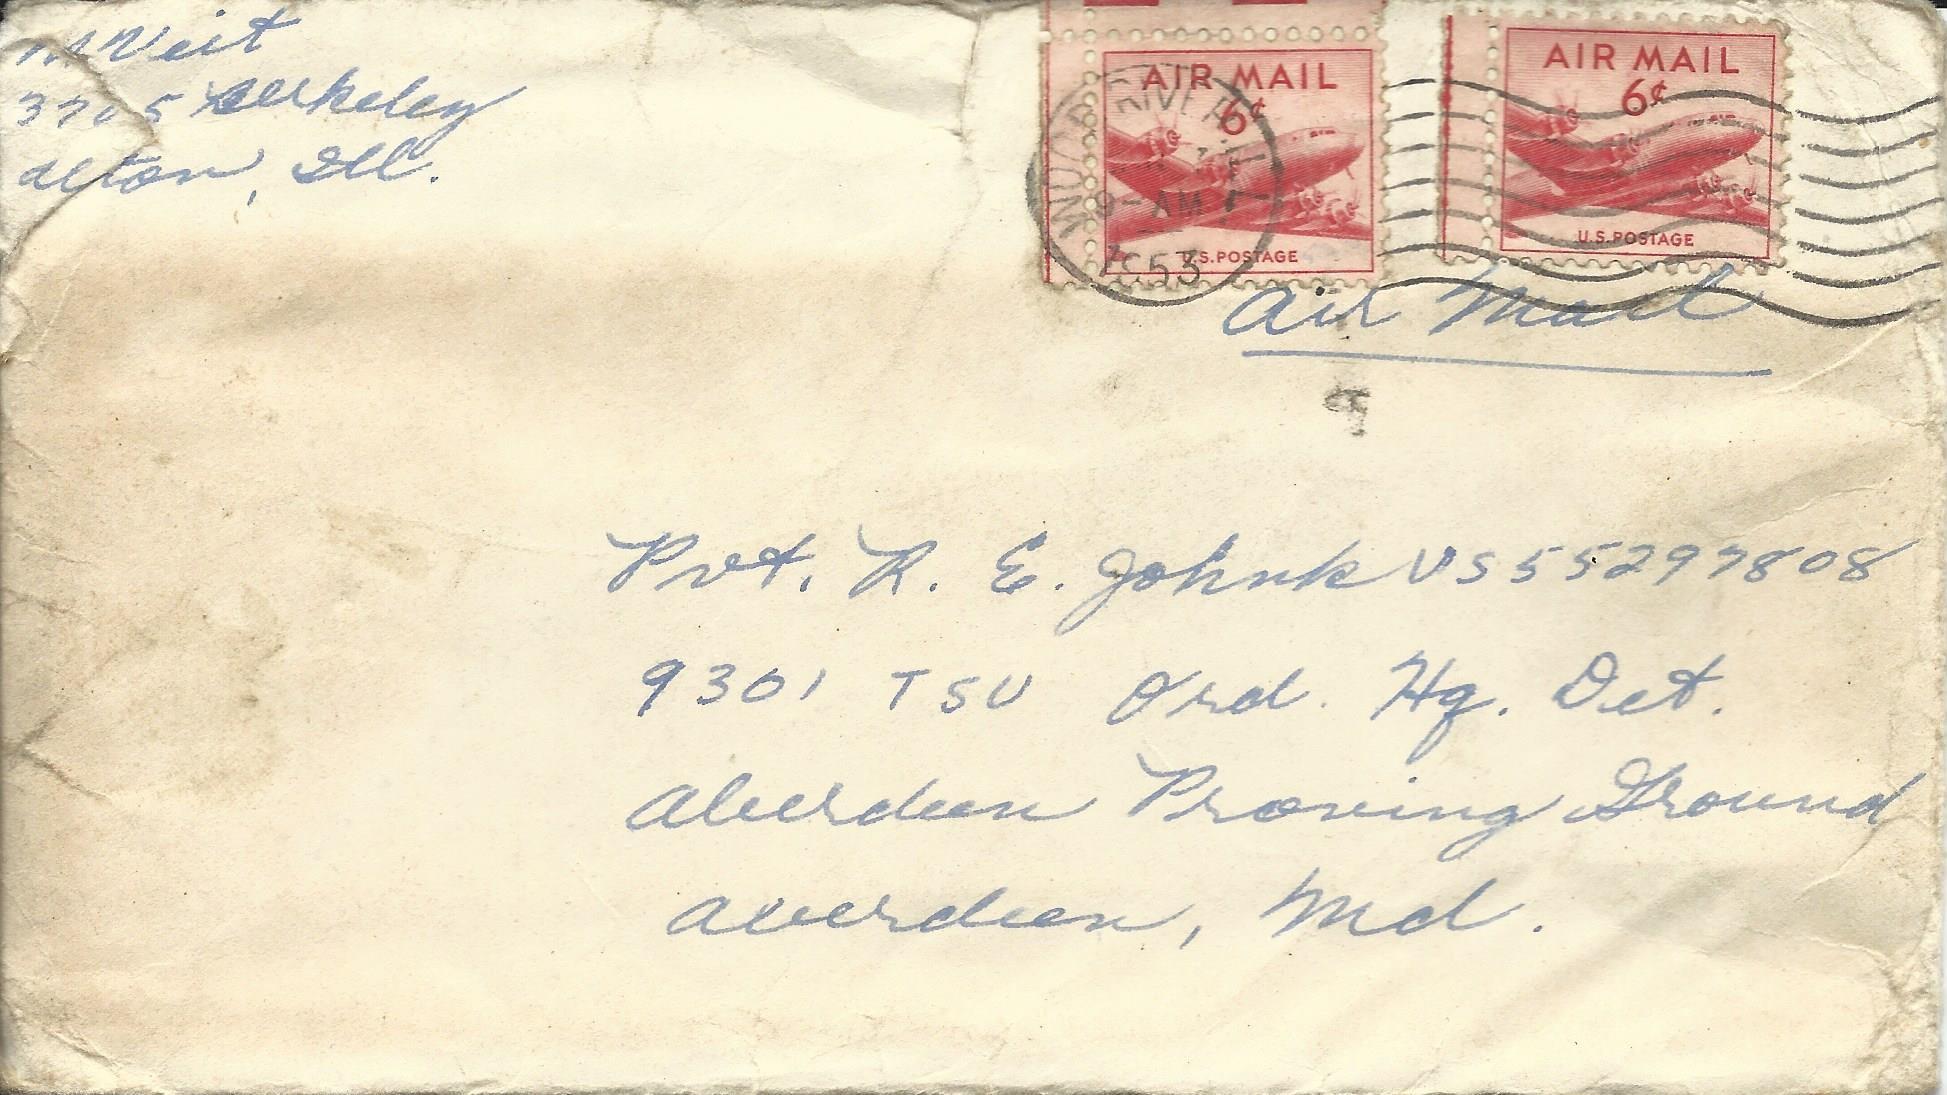 2. Jan. 5, 1953 (Oma)_Page_01.jpg